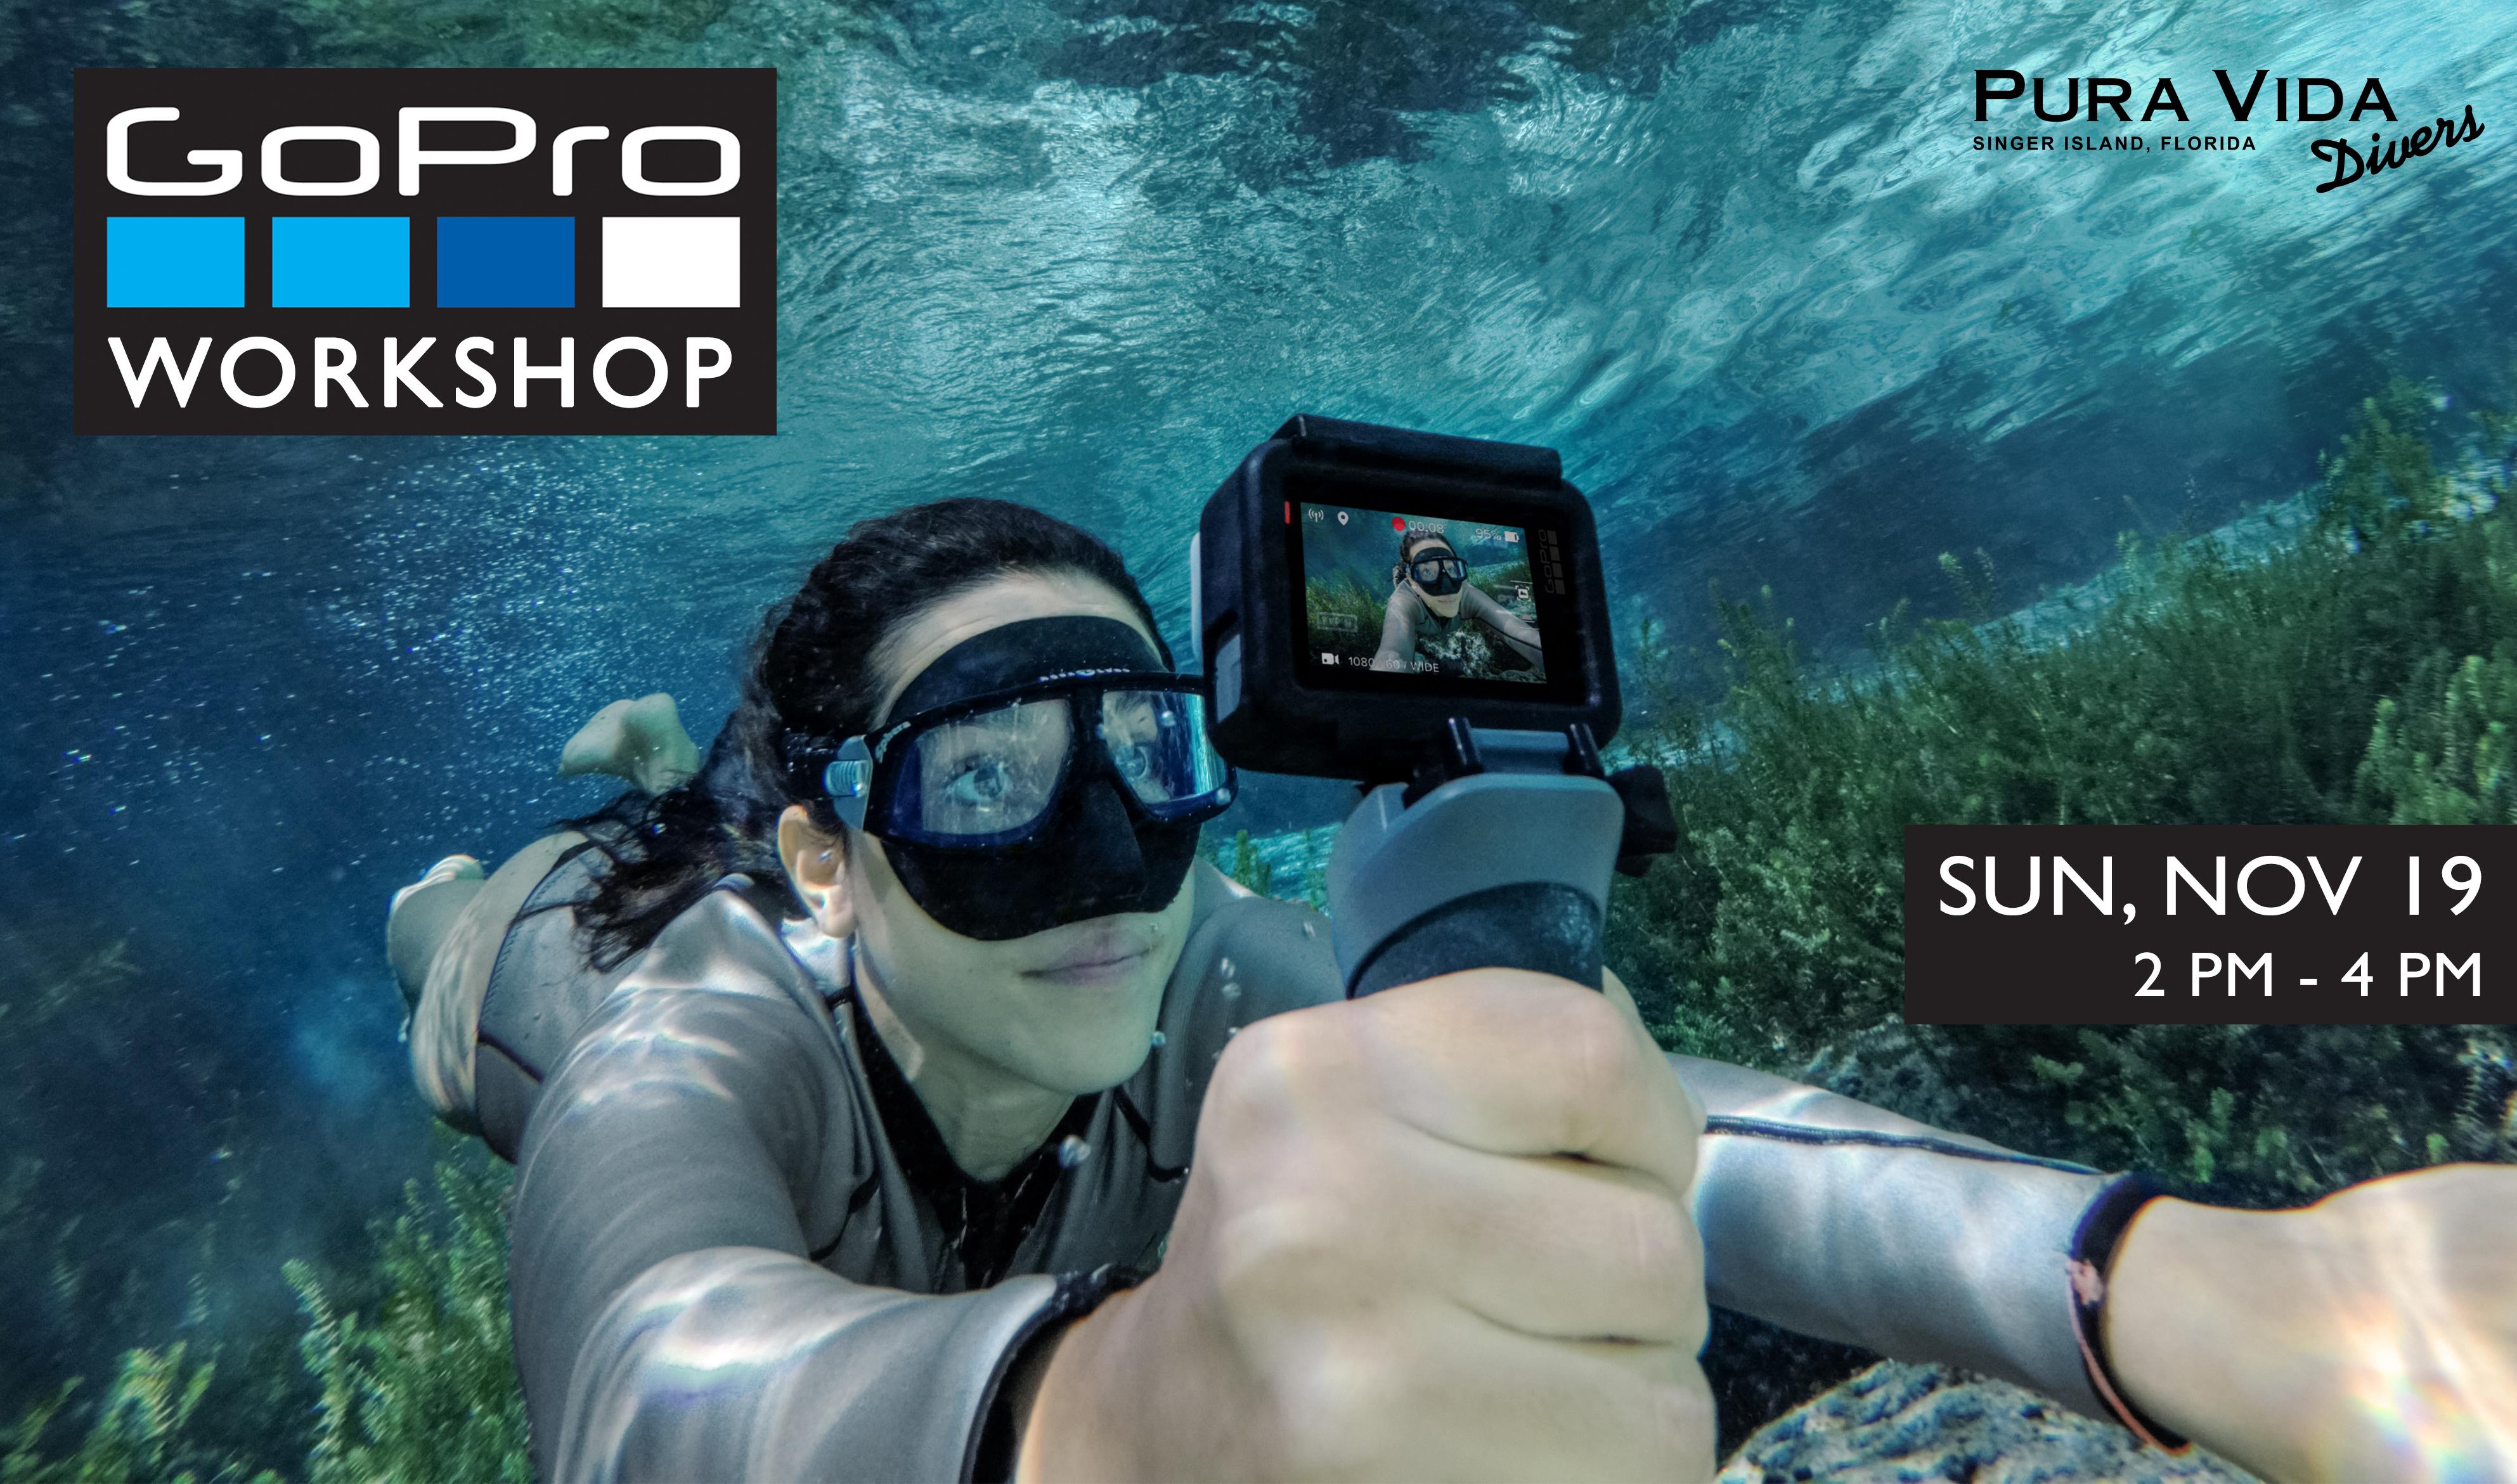 Pura vida divers discover south florida scuba diving nov 19 gopro workshop xflitez Images